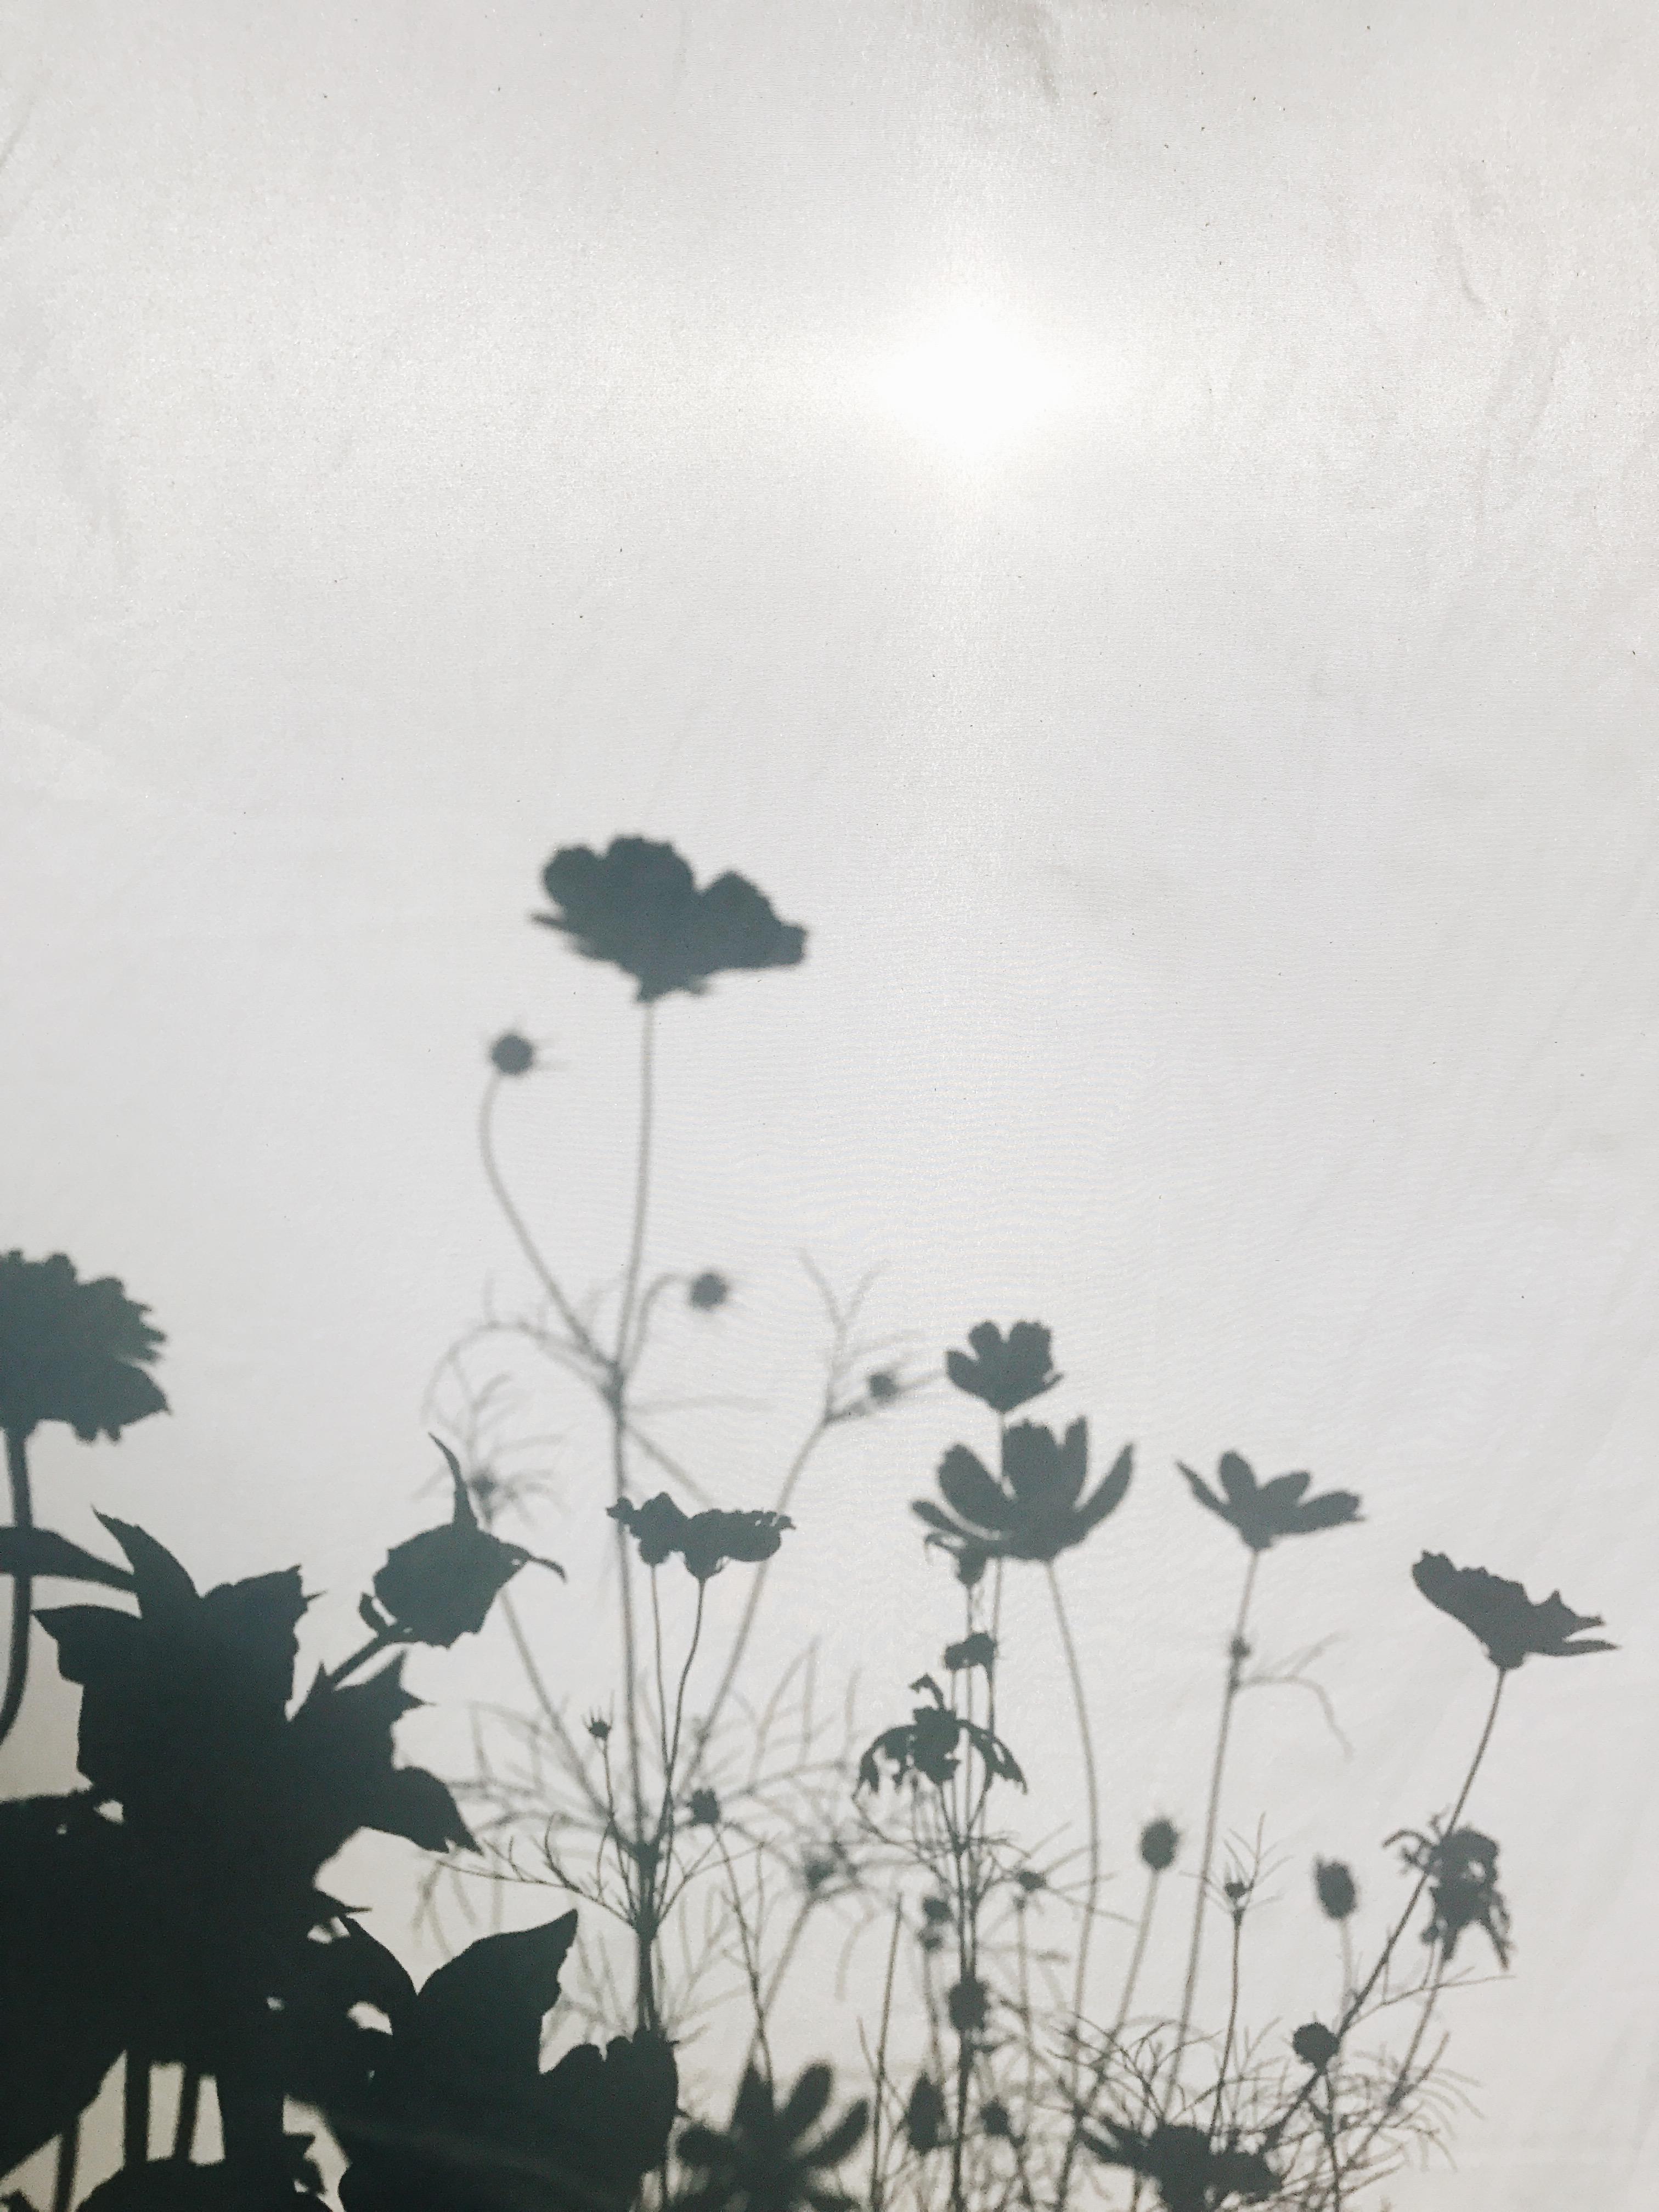 flower shadows behind a sheet